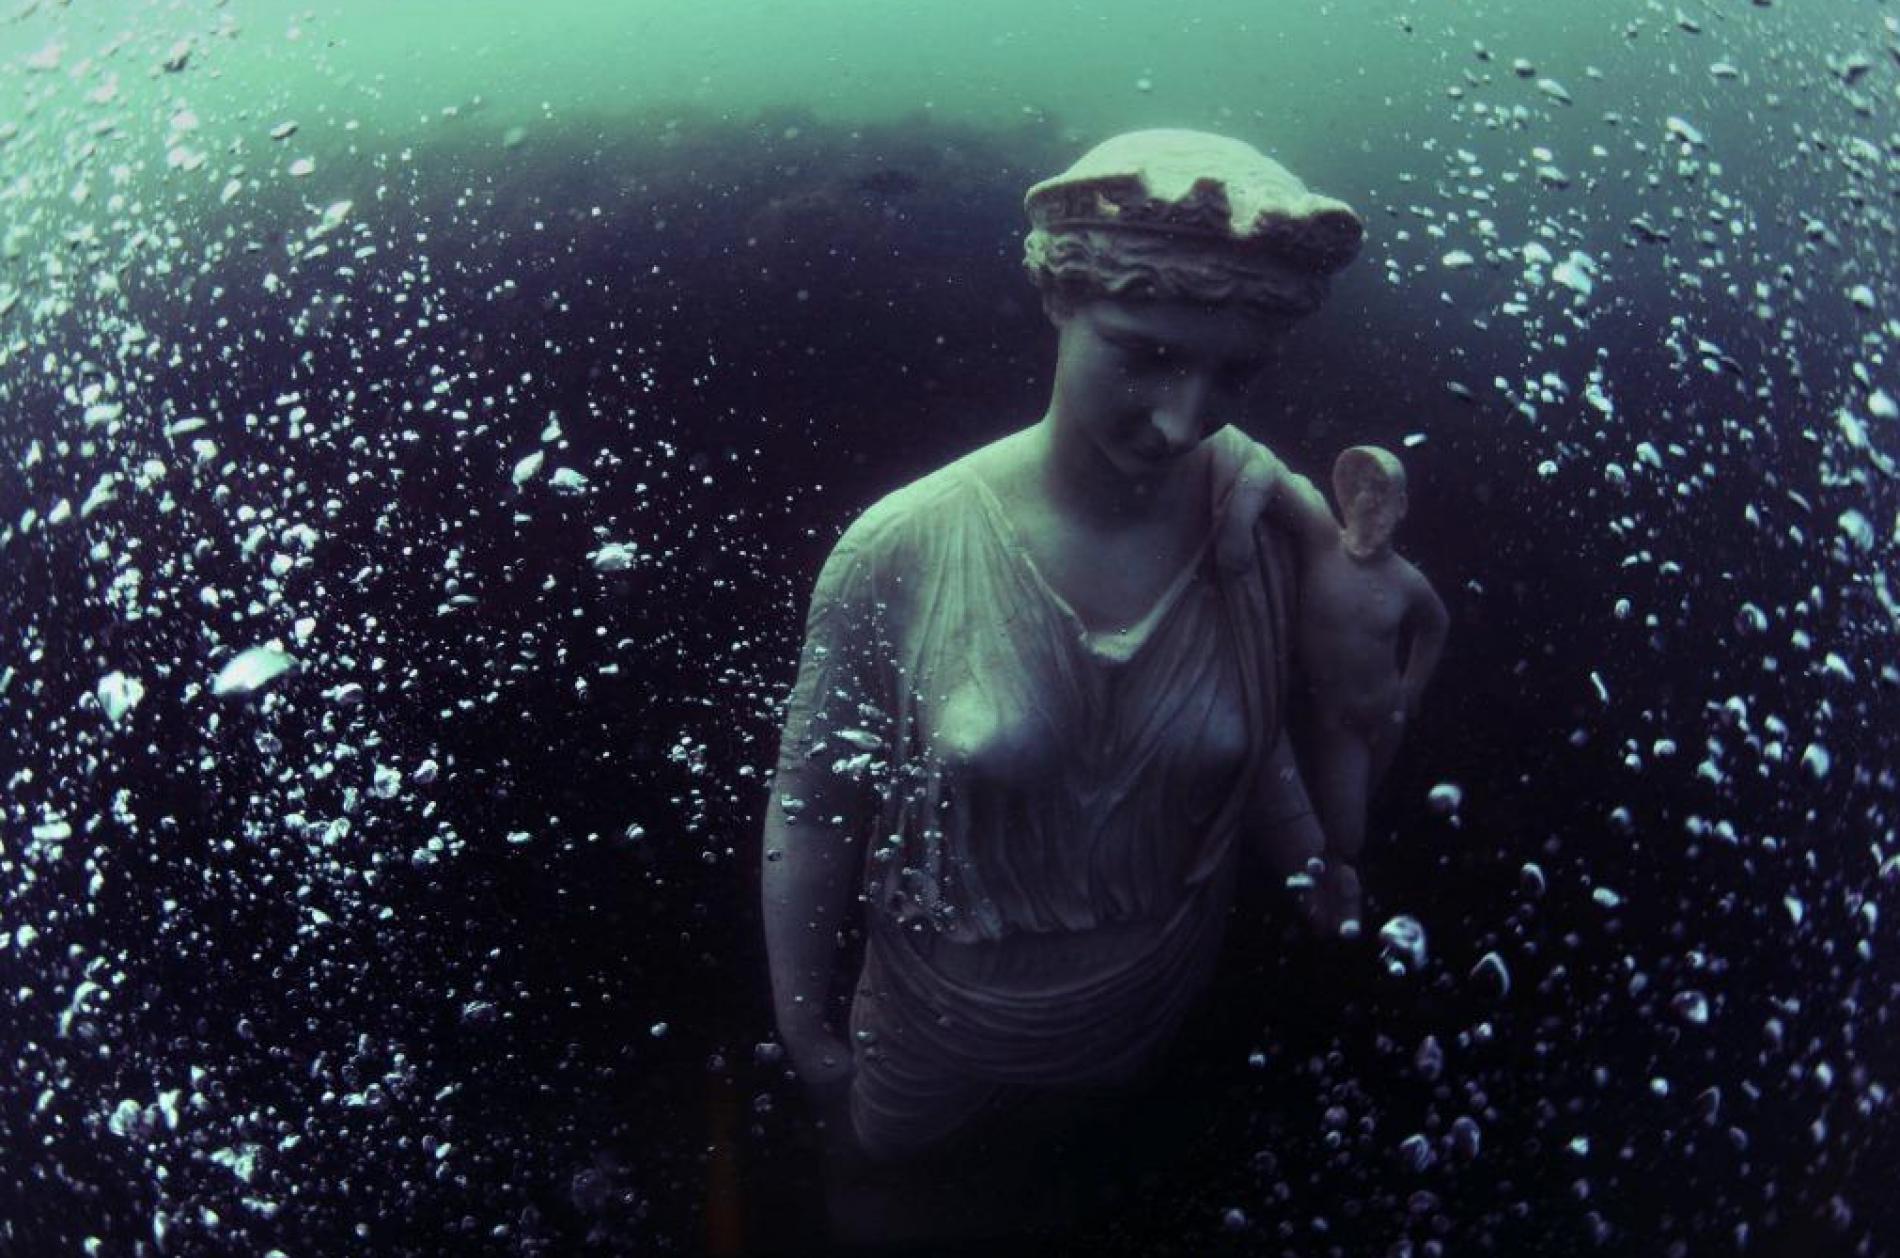 Underwater Archaeology Park of Baia, Pozzuoli, Italy / Photographer : Stefano Mei